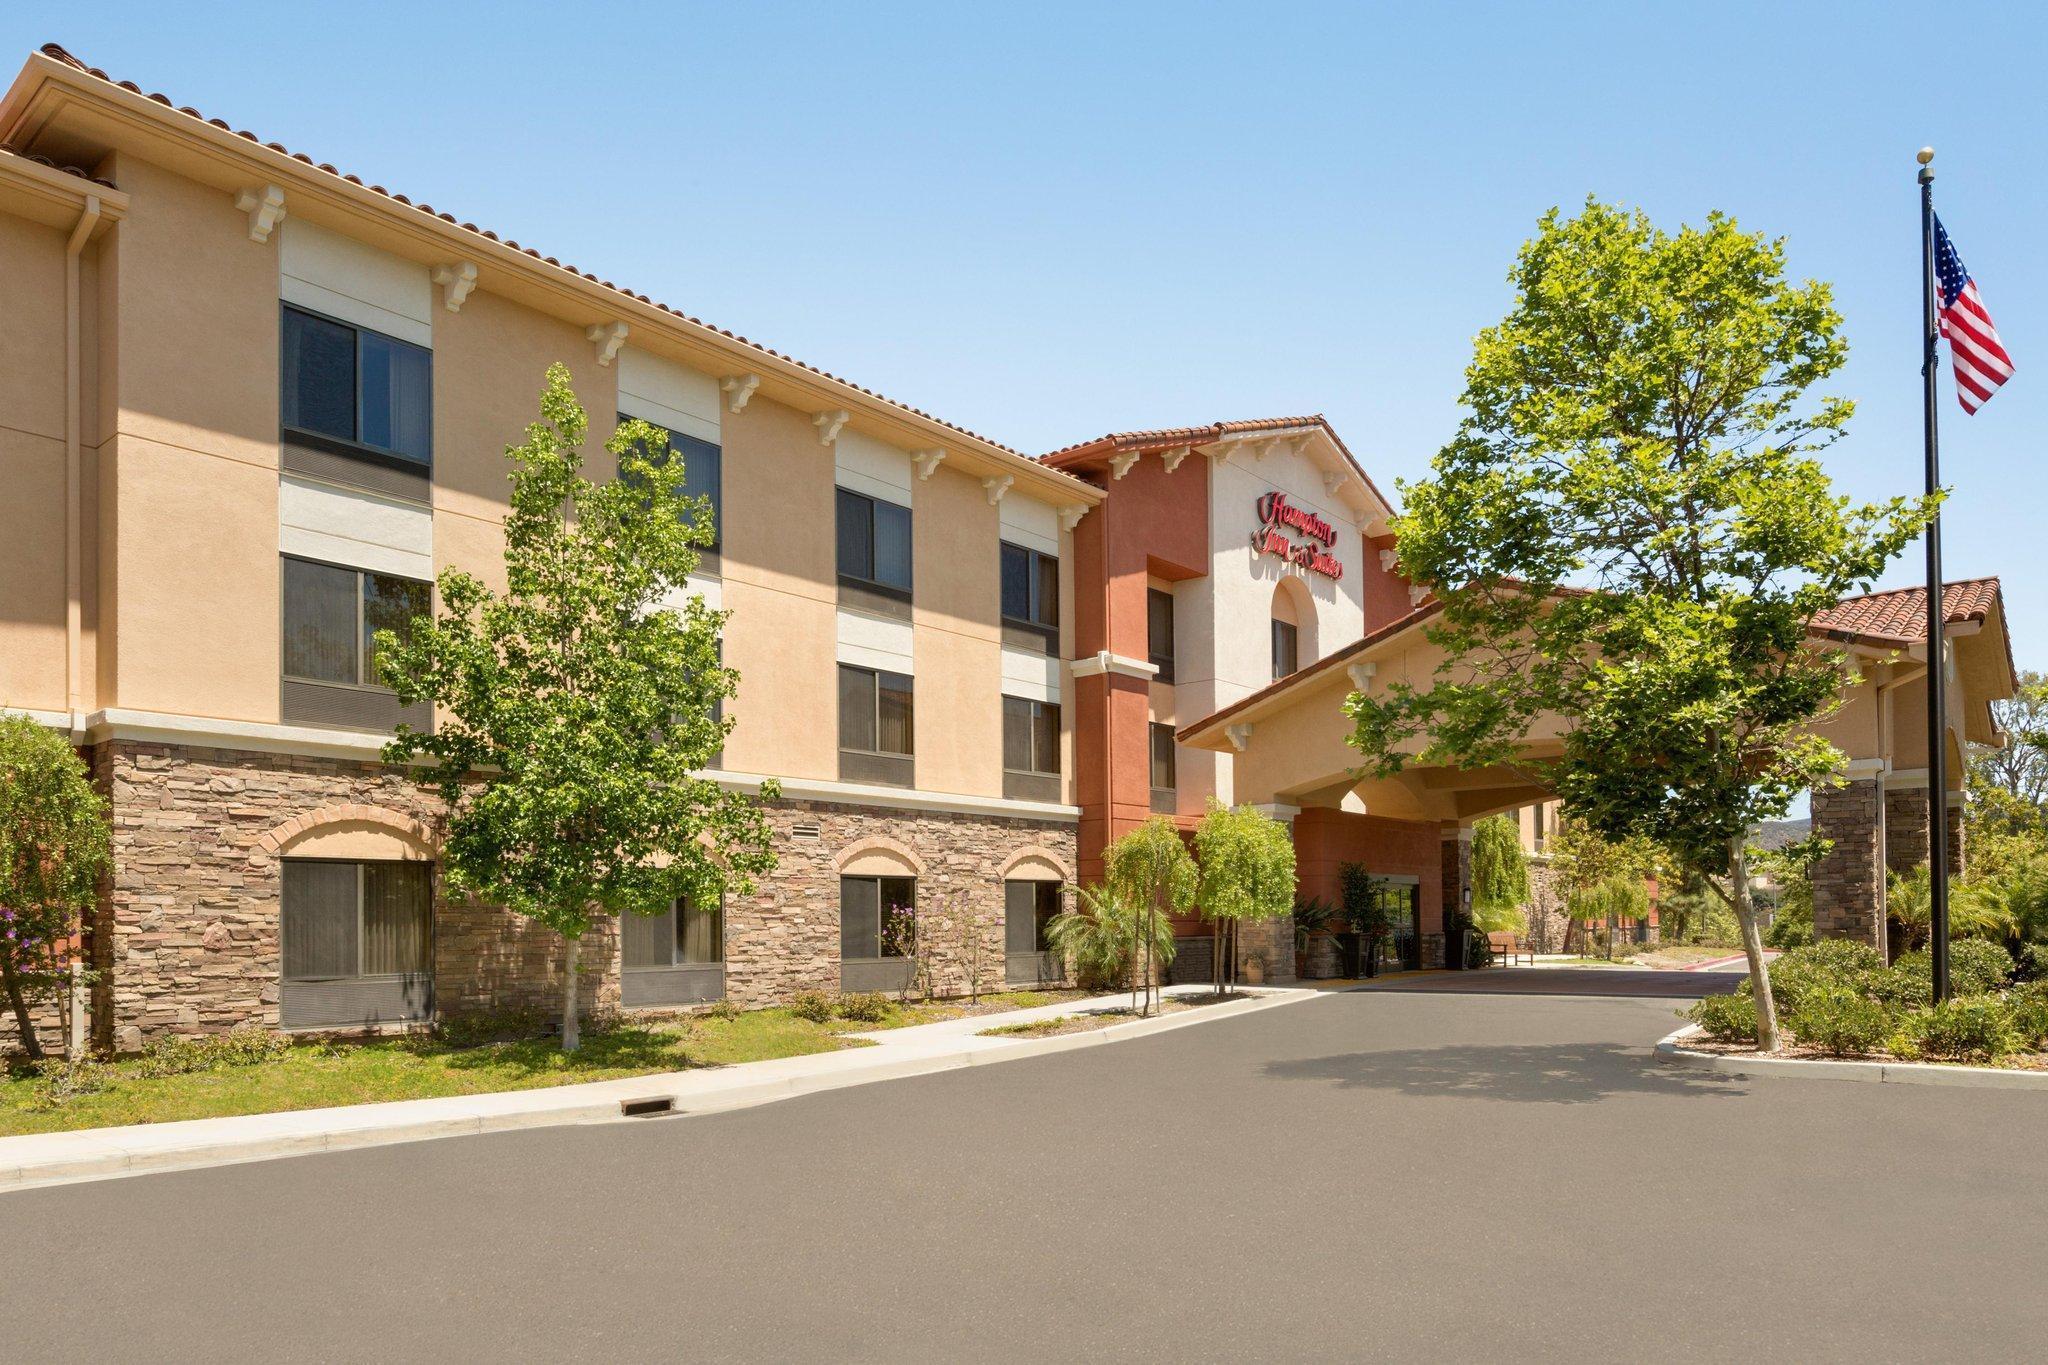 Hampton Inn and Suites Thousand Oaks, Ventura